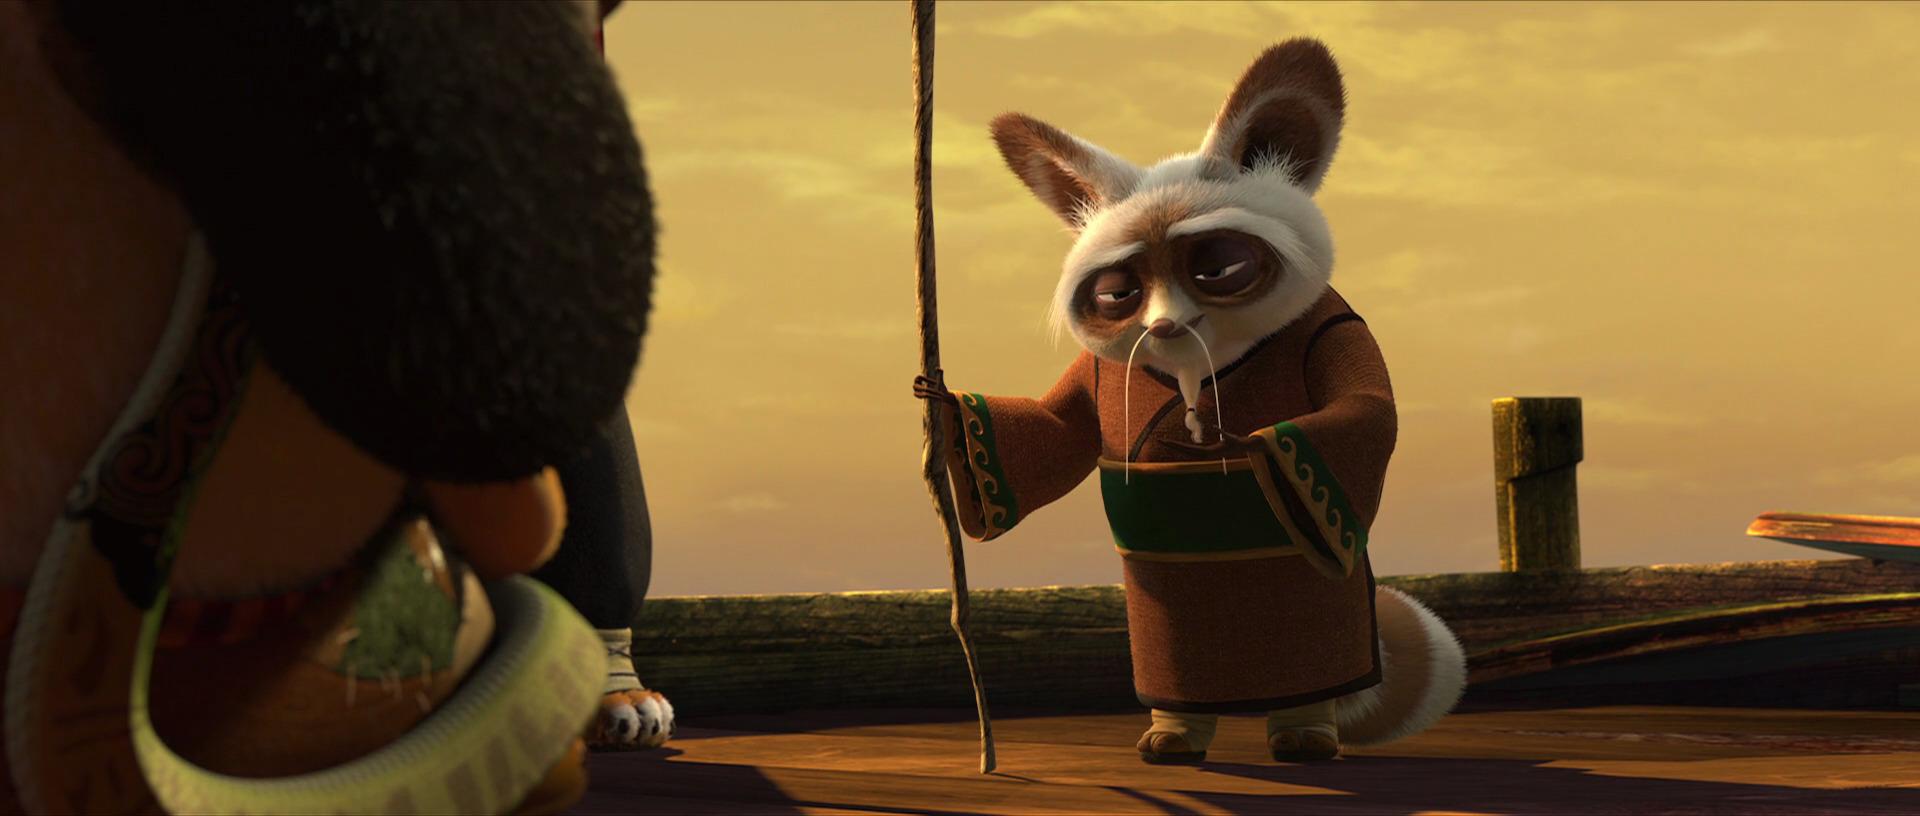 Kungfu2 - Kung fu panda shifu ...